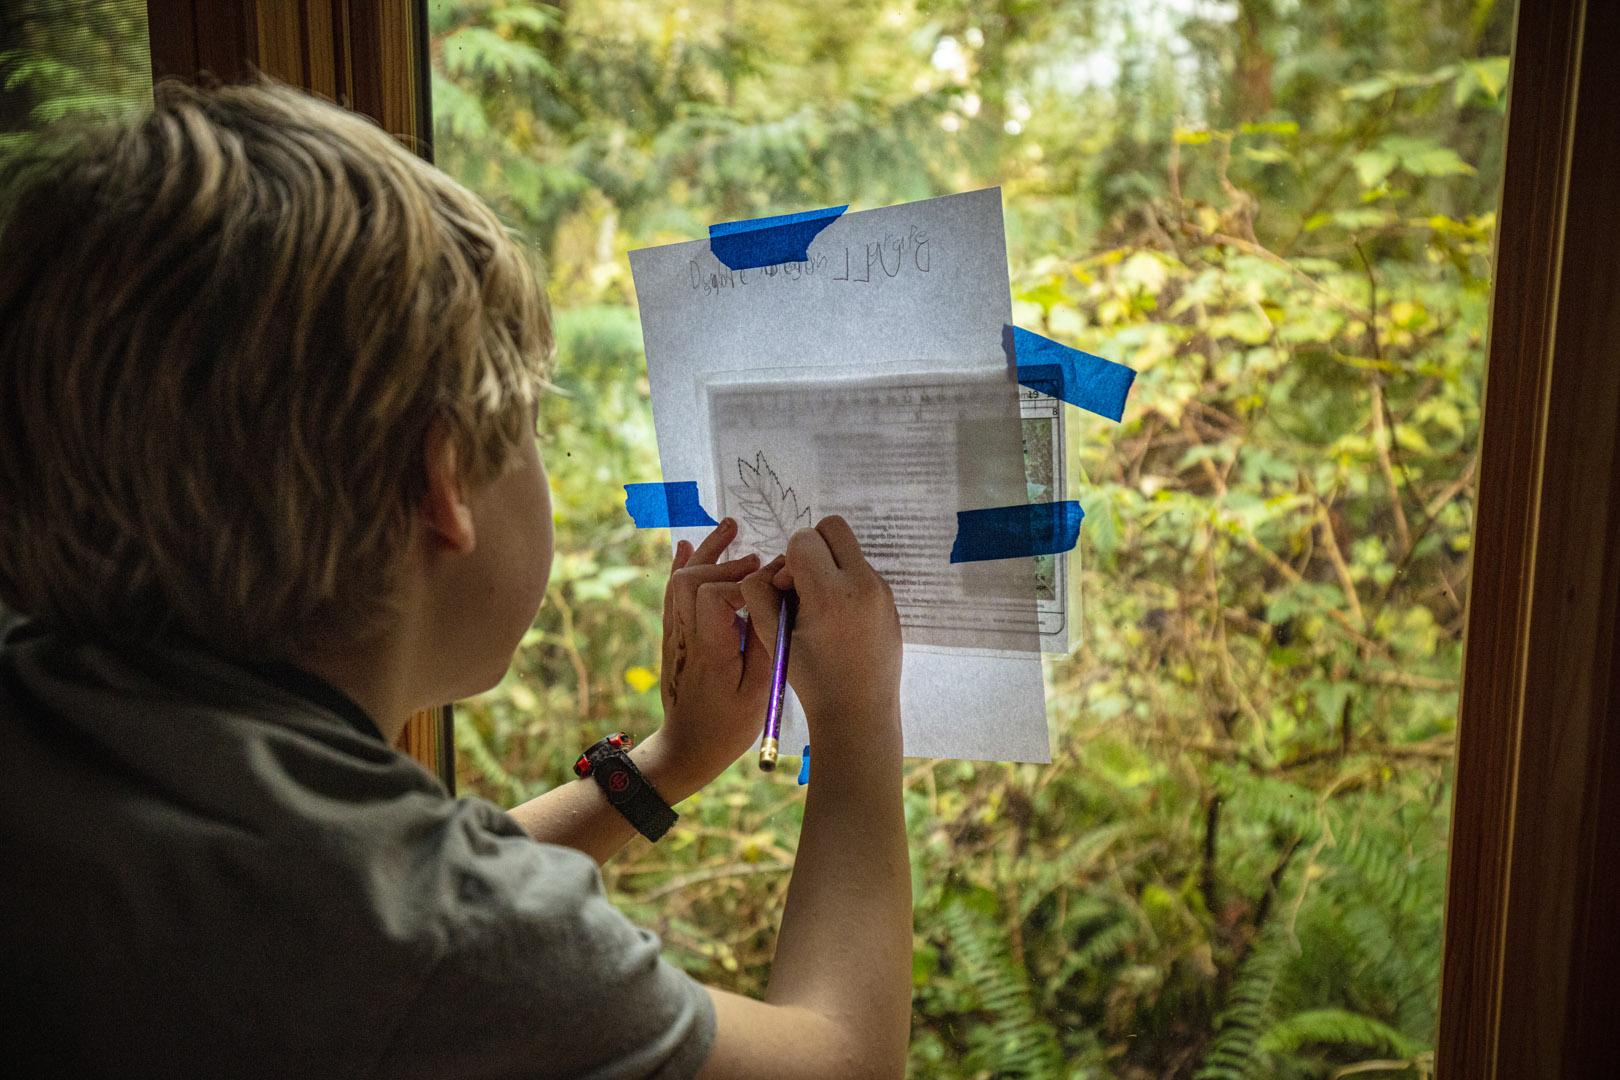 Environmental Science Education at IslandWood